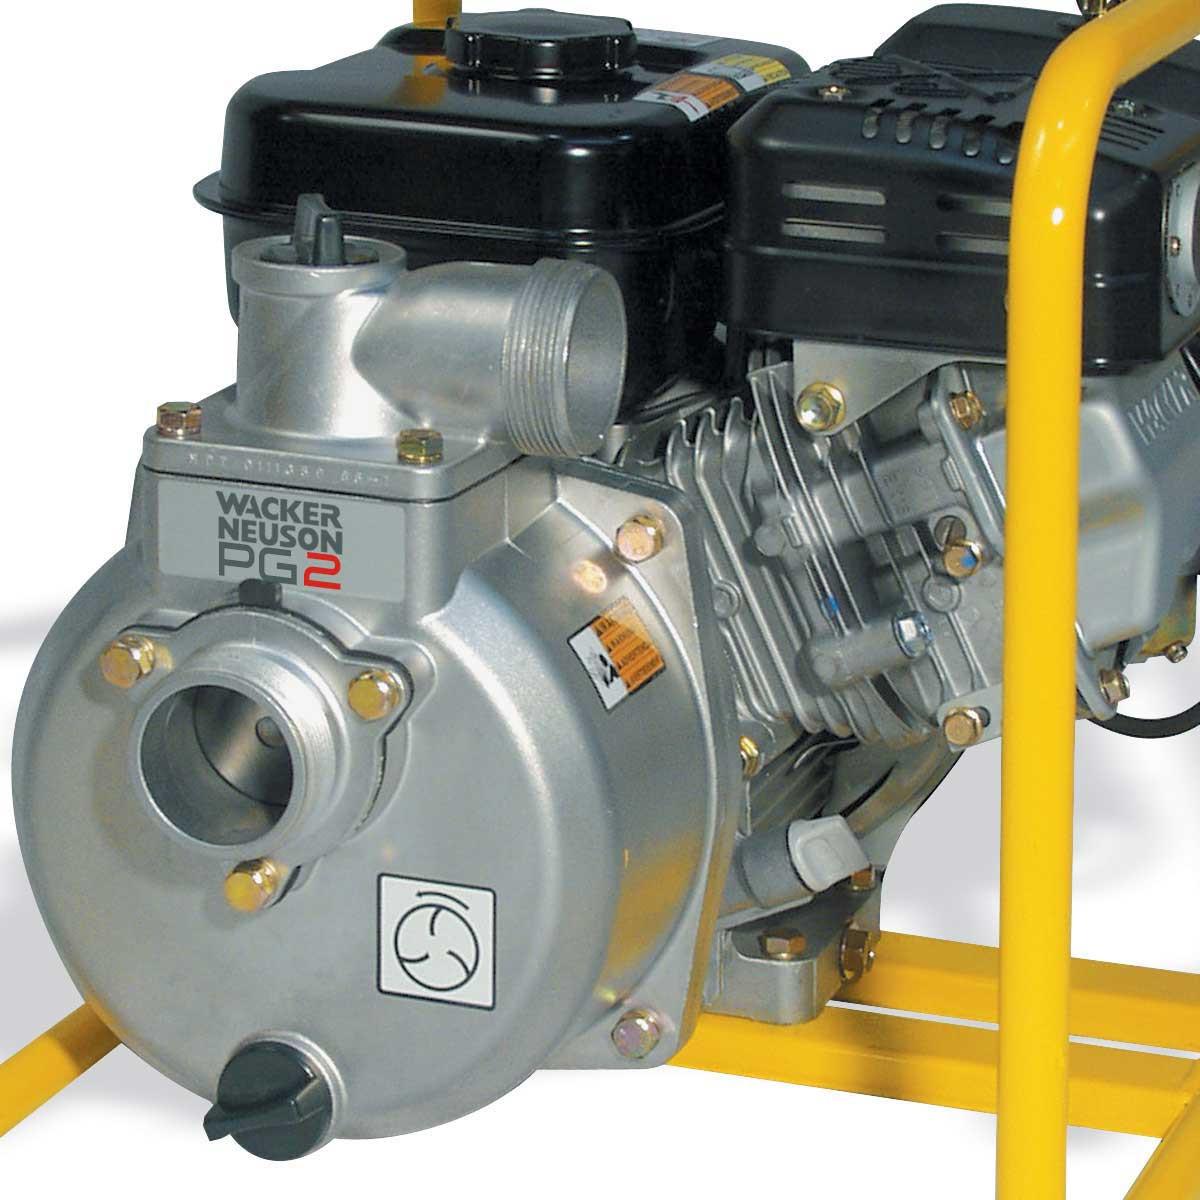 2 inch PG2A Wacker Neuson Centrifugal Dewatering Pump